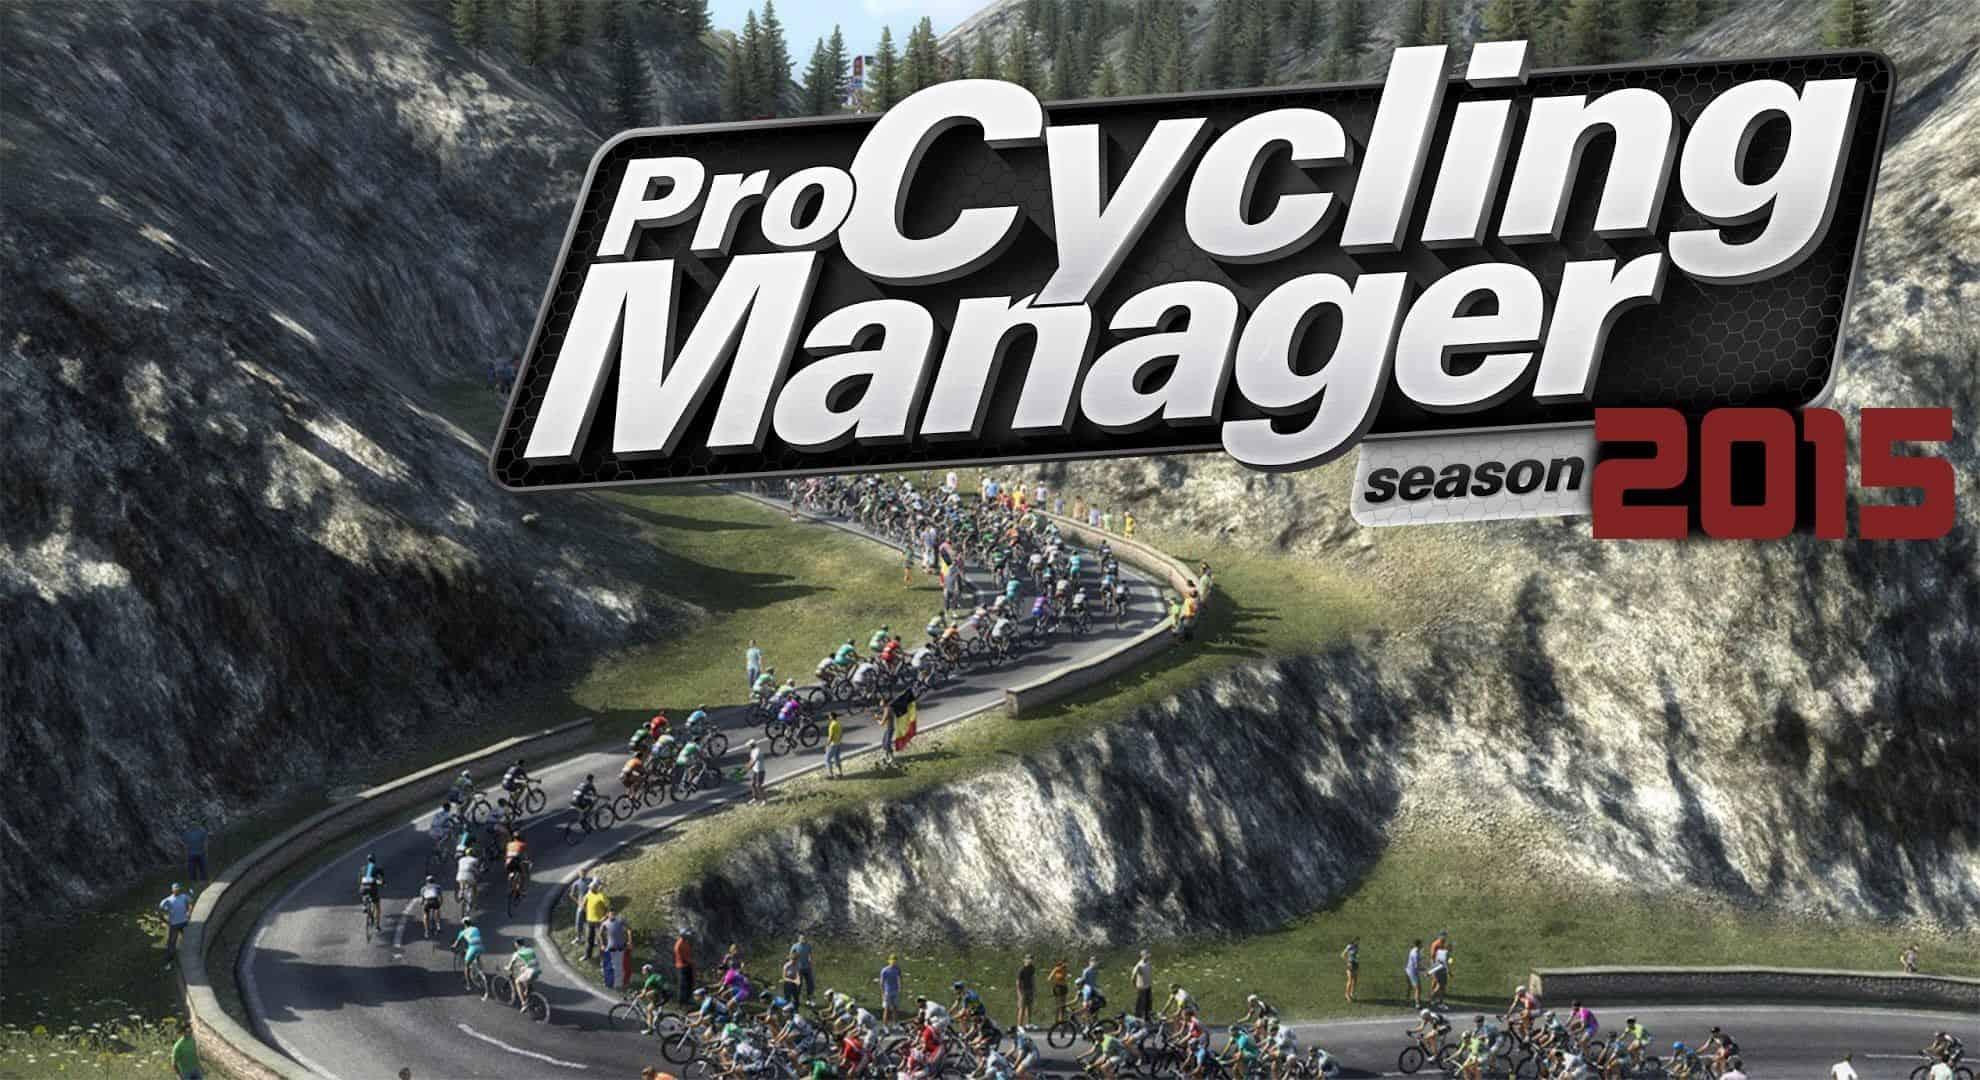 Pro Cycling Manager 2015 herunterladen PC